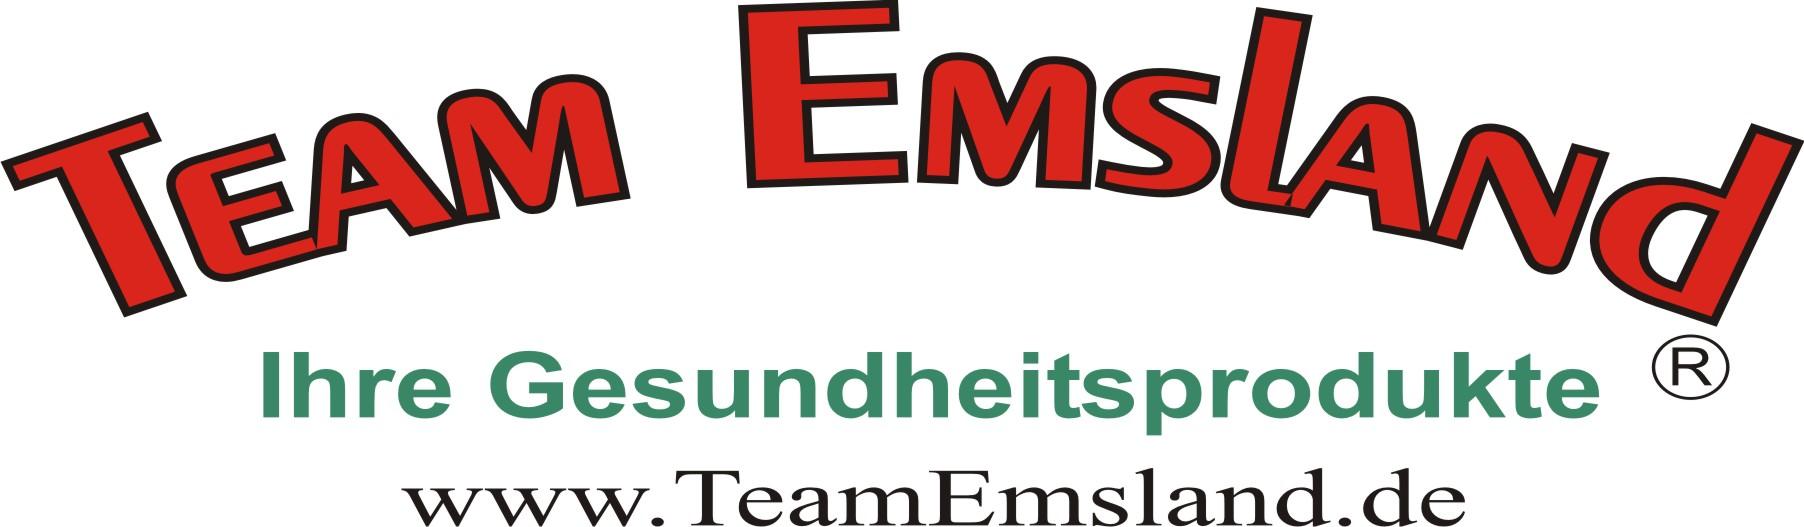 Team Emsland